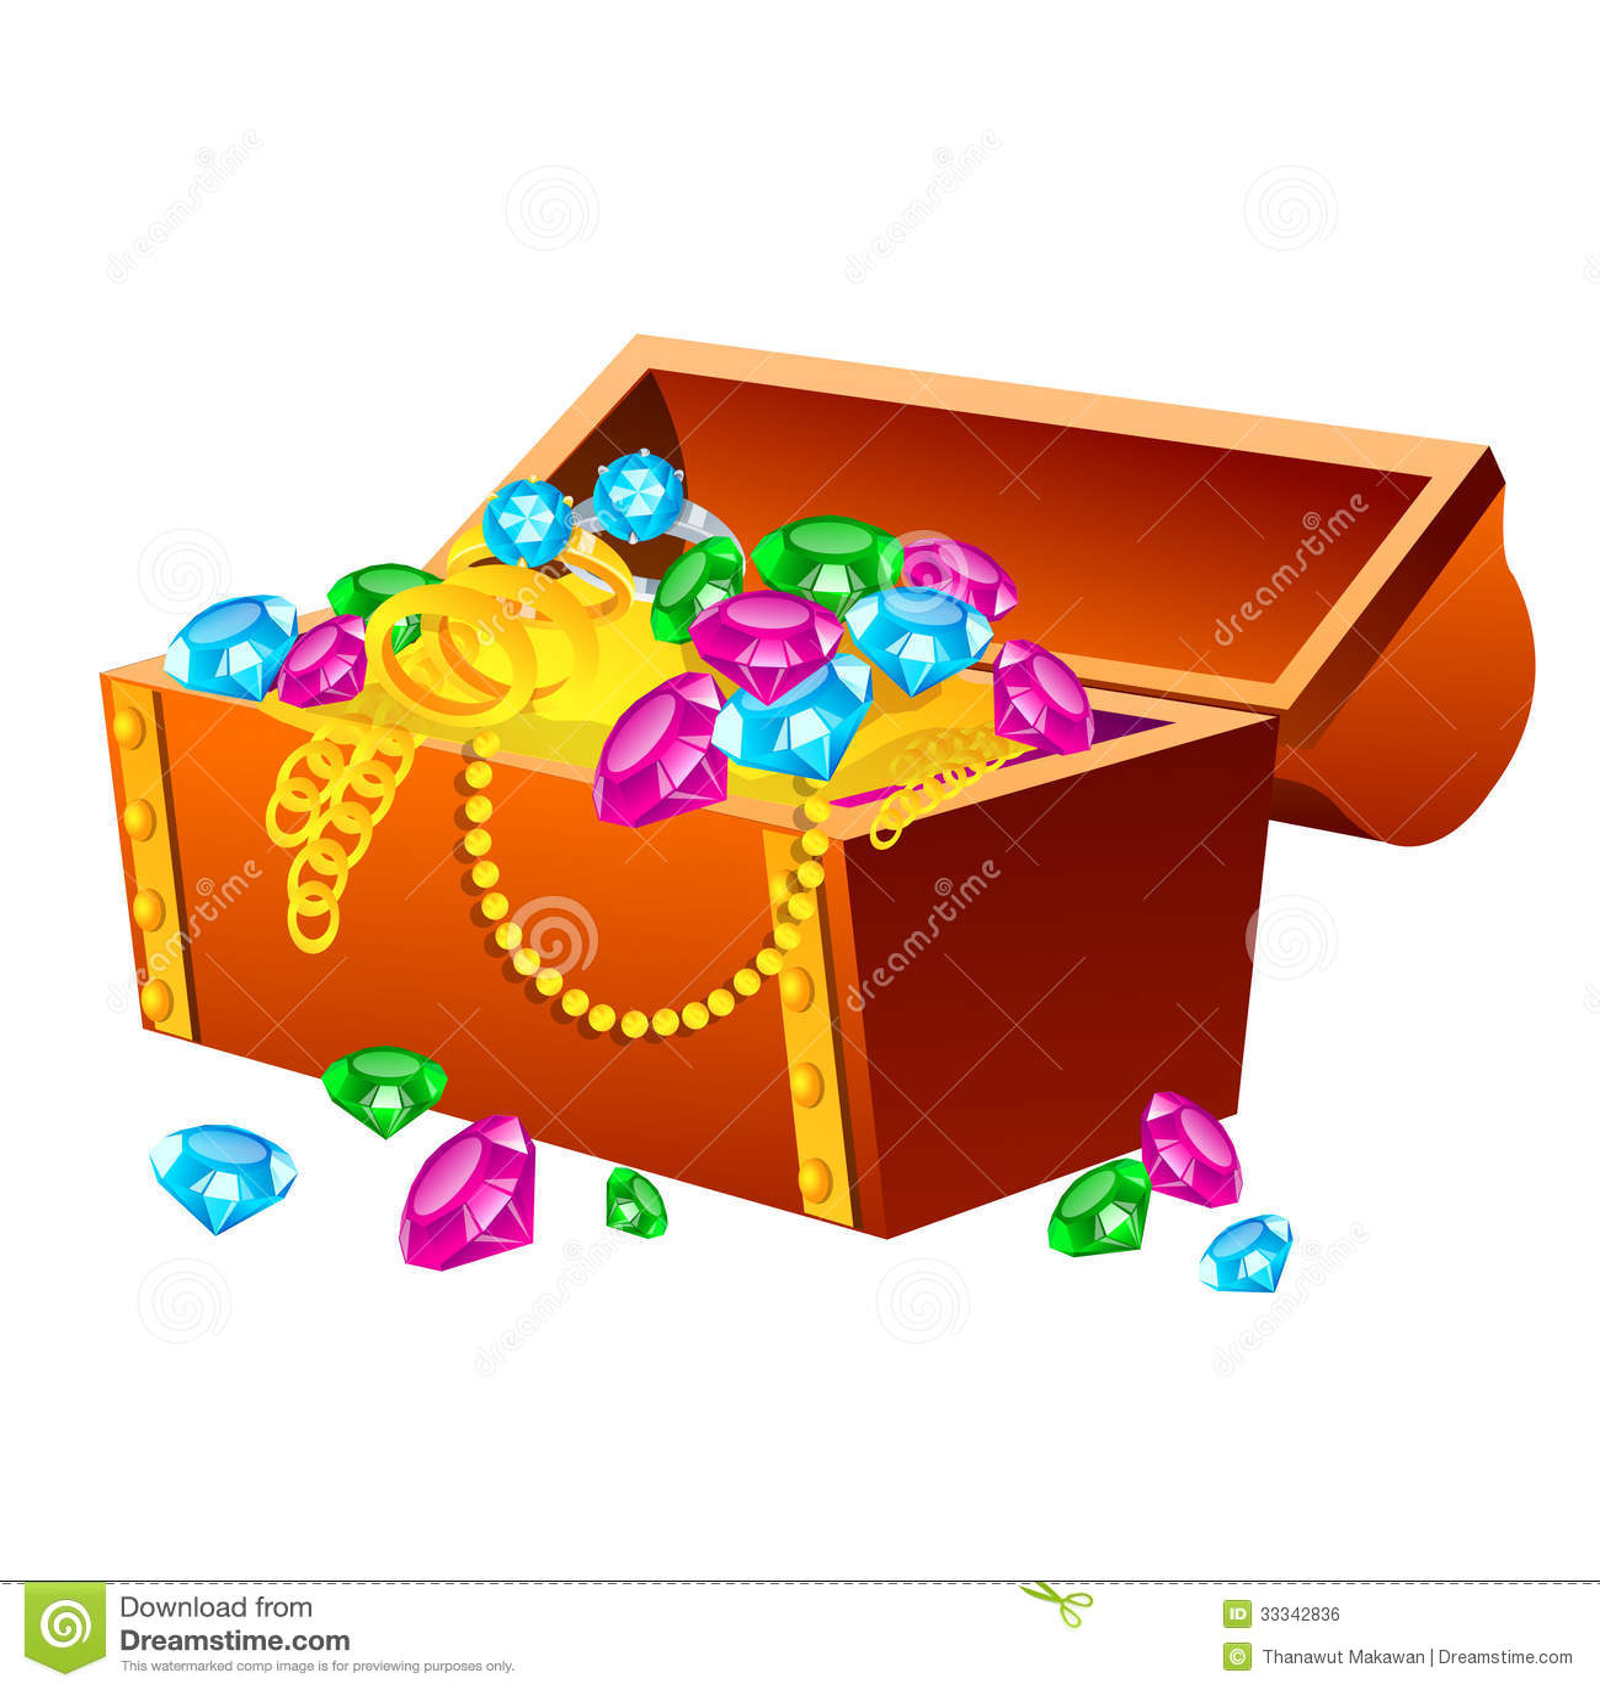 treasure chest royalty free stock image image 33342836 free treasure chest clipart images free pirate treasure chest clipart